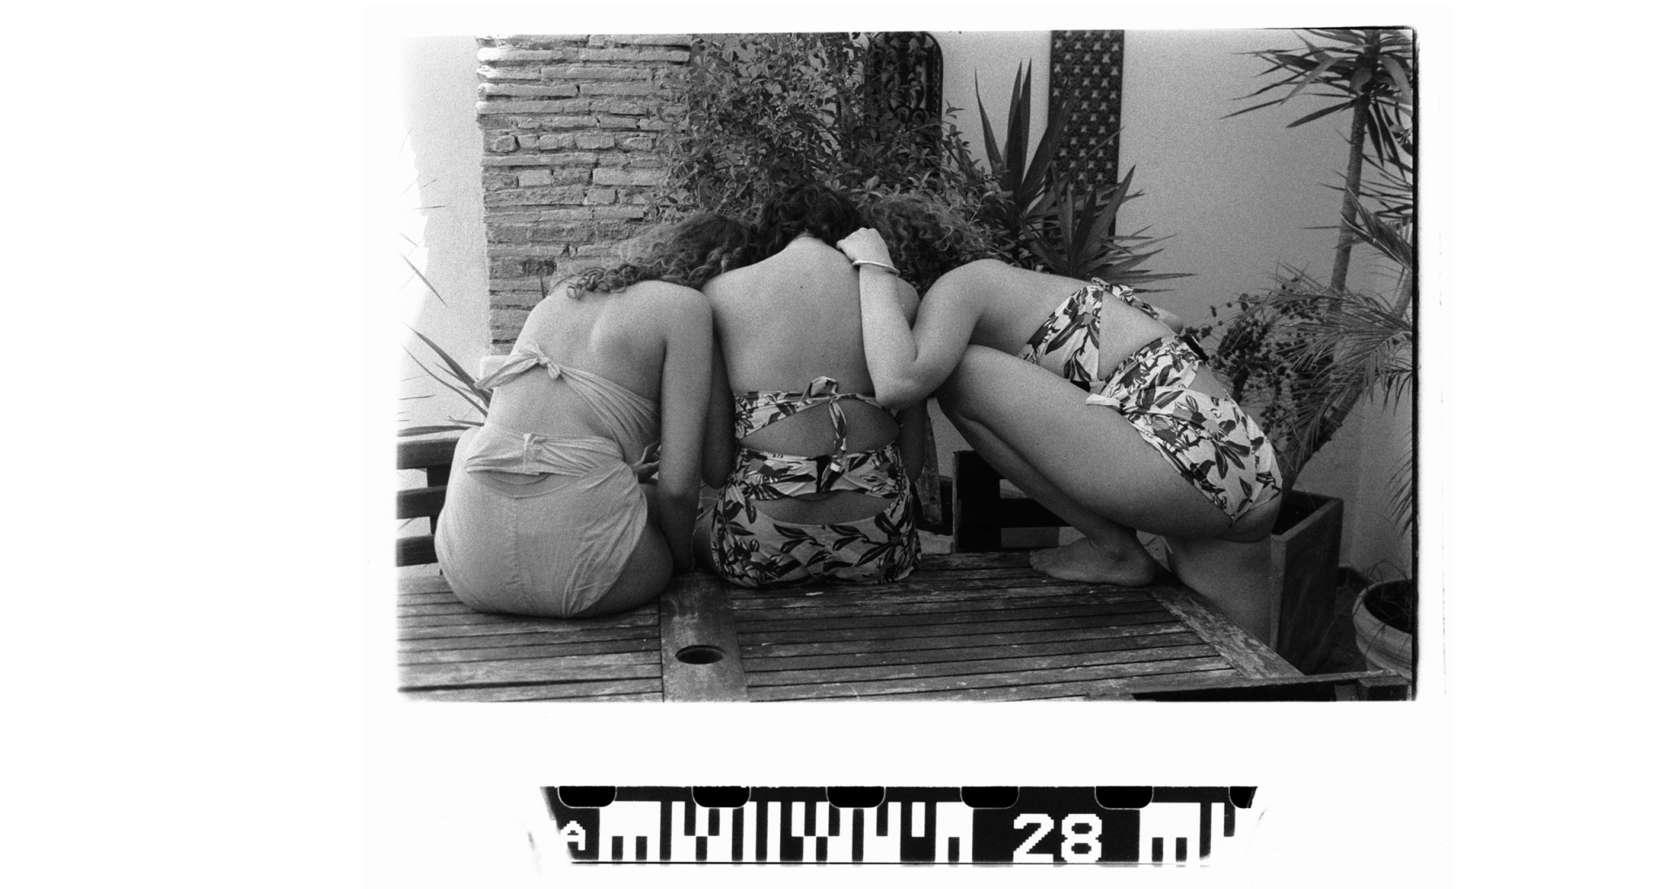 Efisio-Marras-011-1660x889.jpg